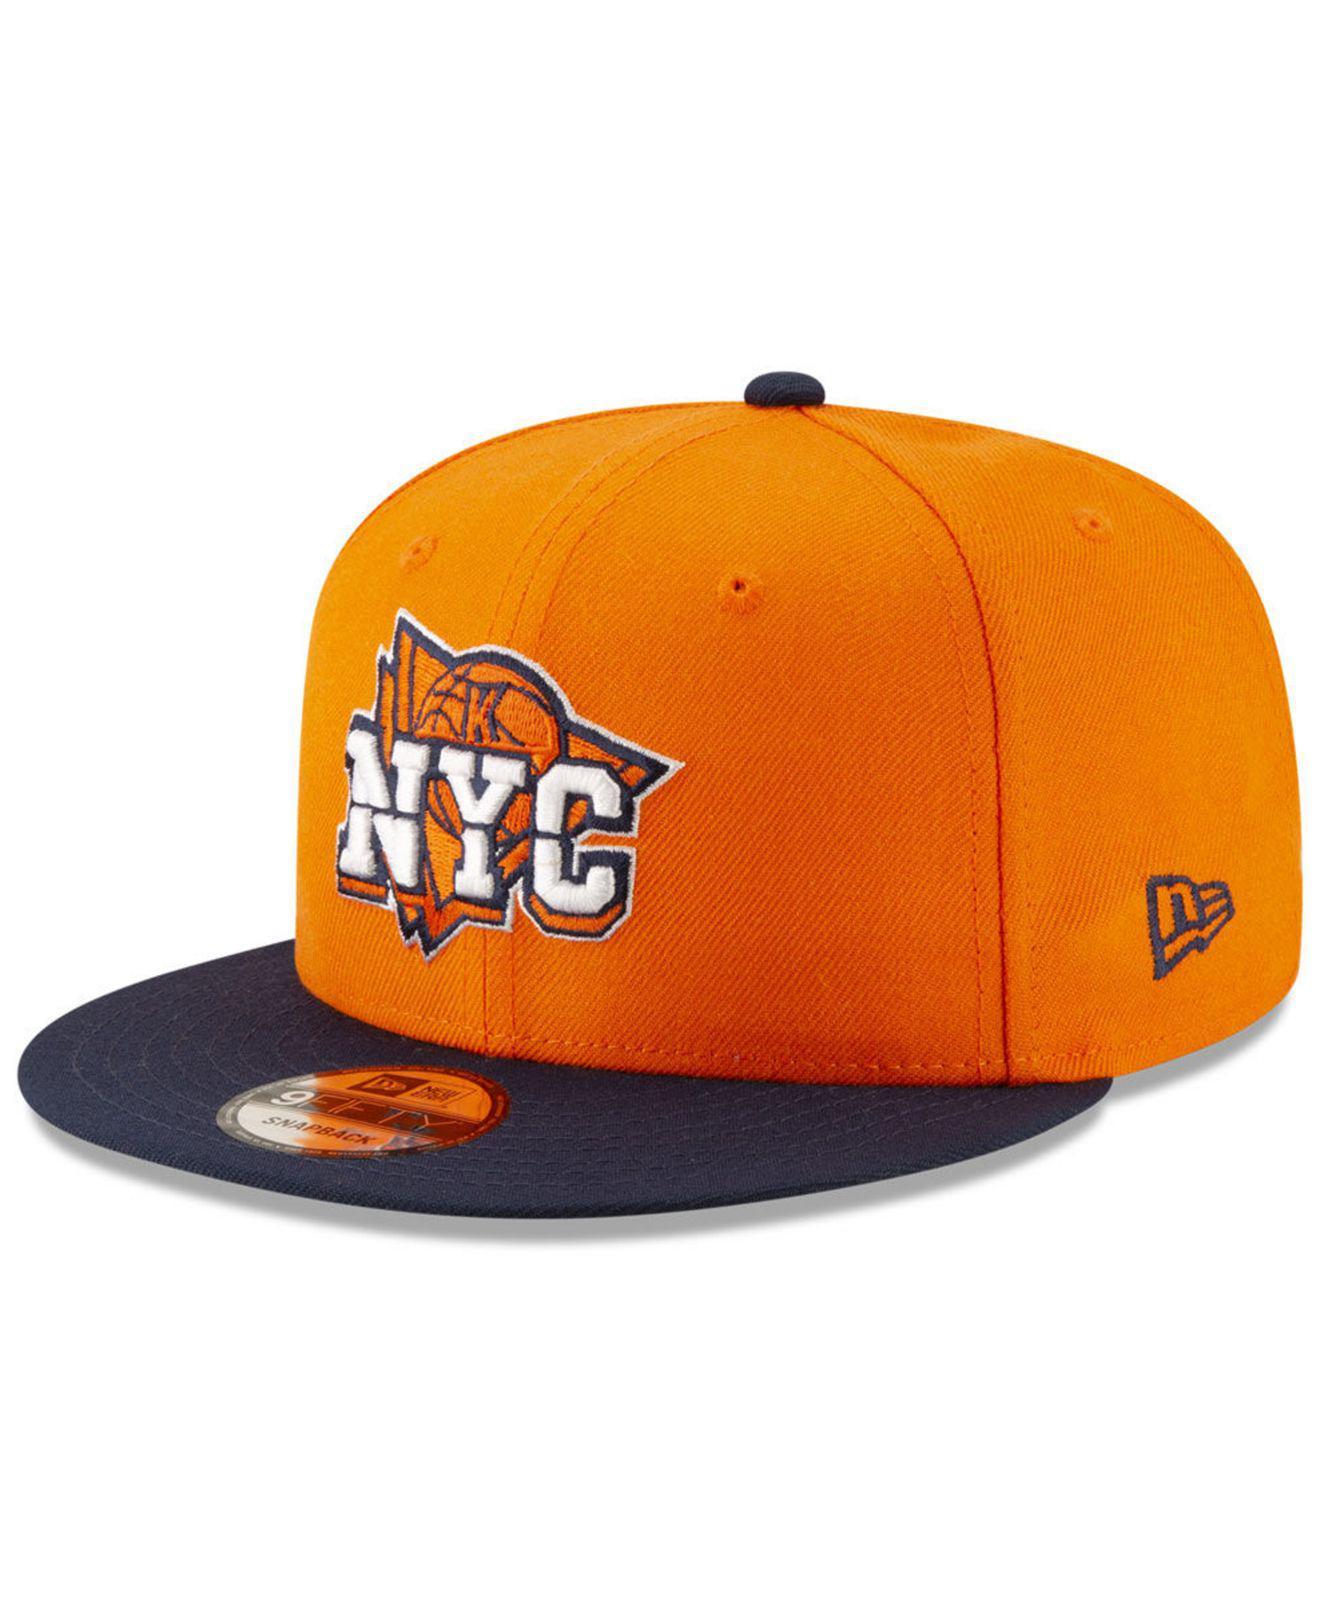 04862b7313525 Lyst - KTZ New York Knicks Light City Combo 9fifty Snapback Cap in ...